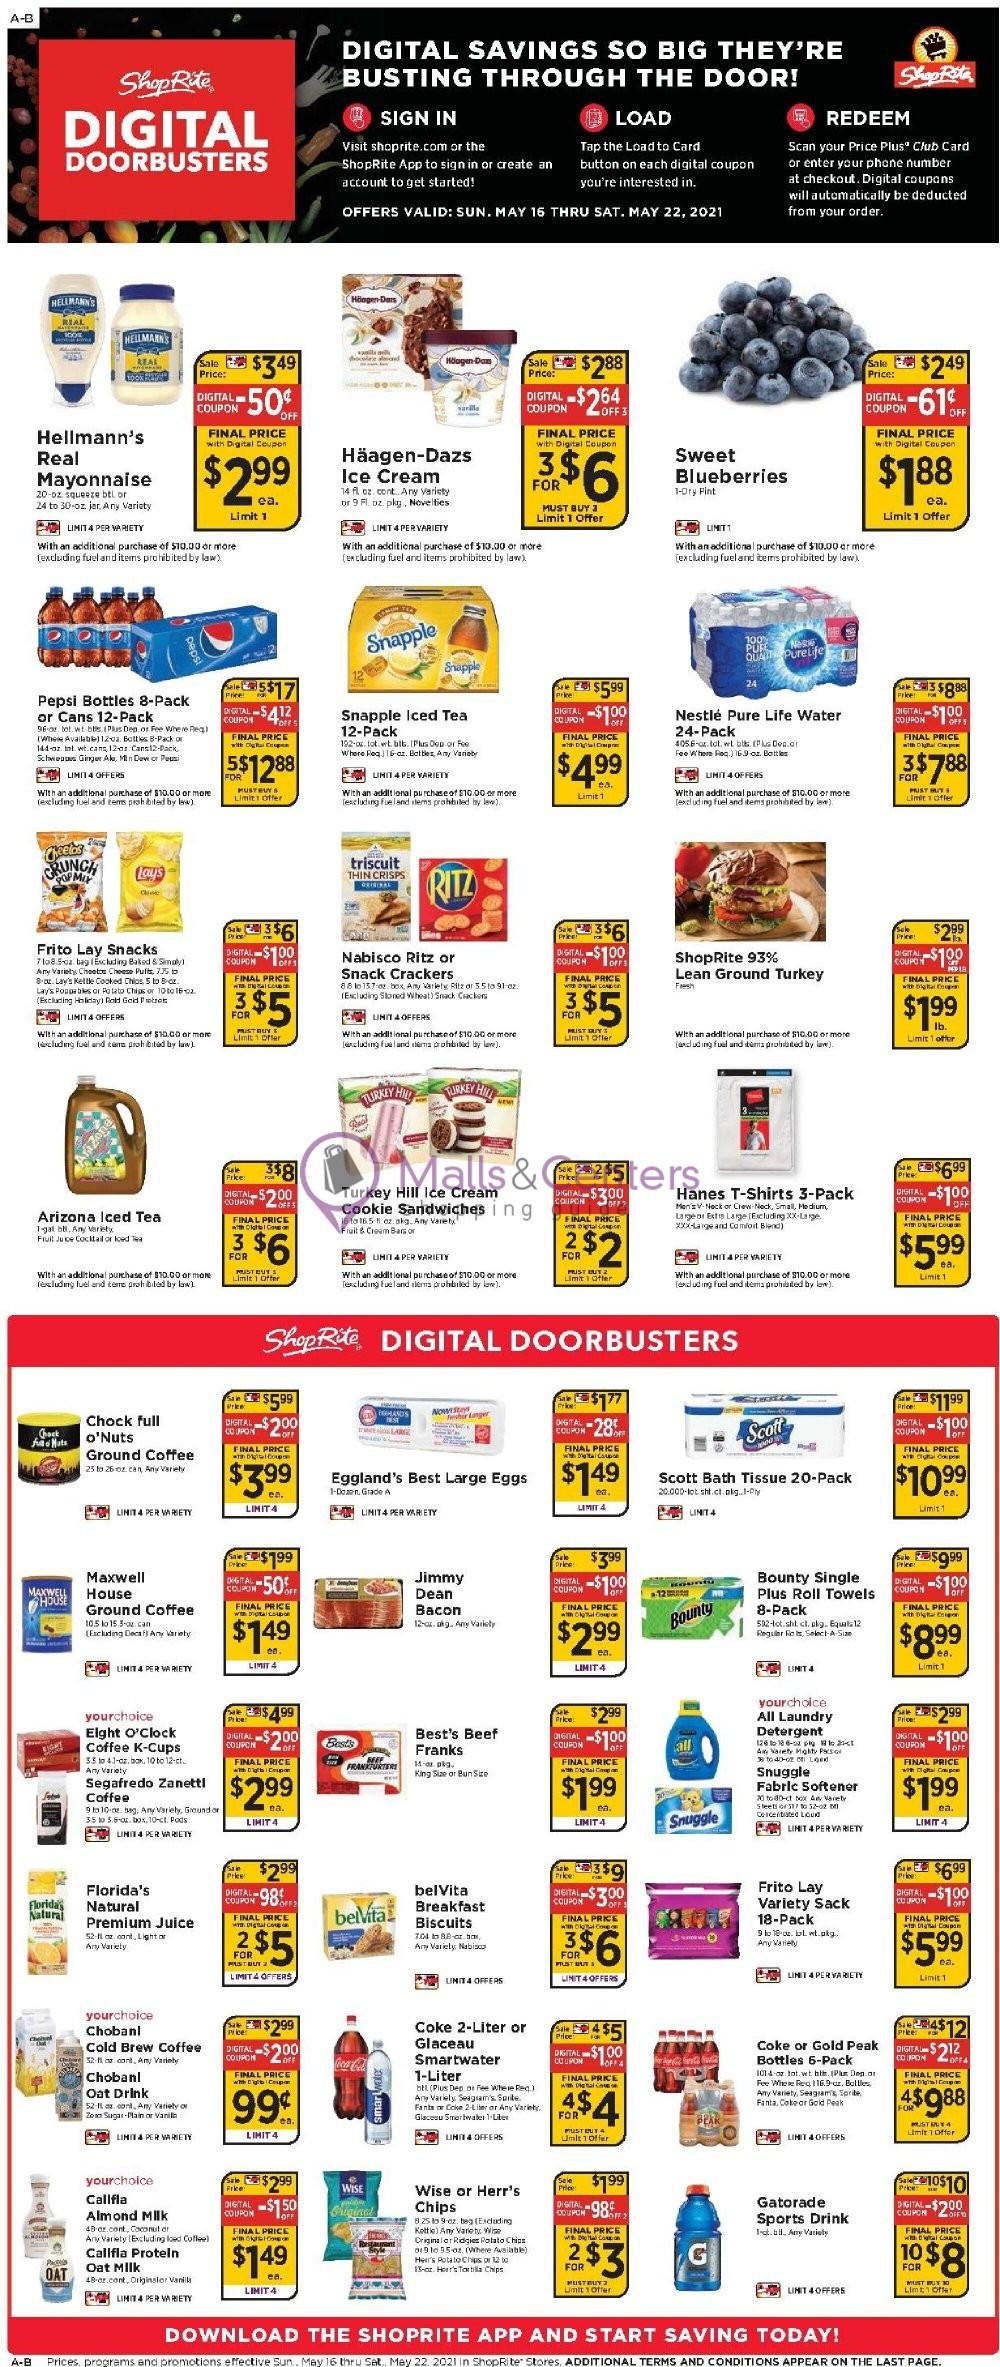 weekly ads ShopRite - page 1 - mallscenters.com